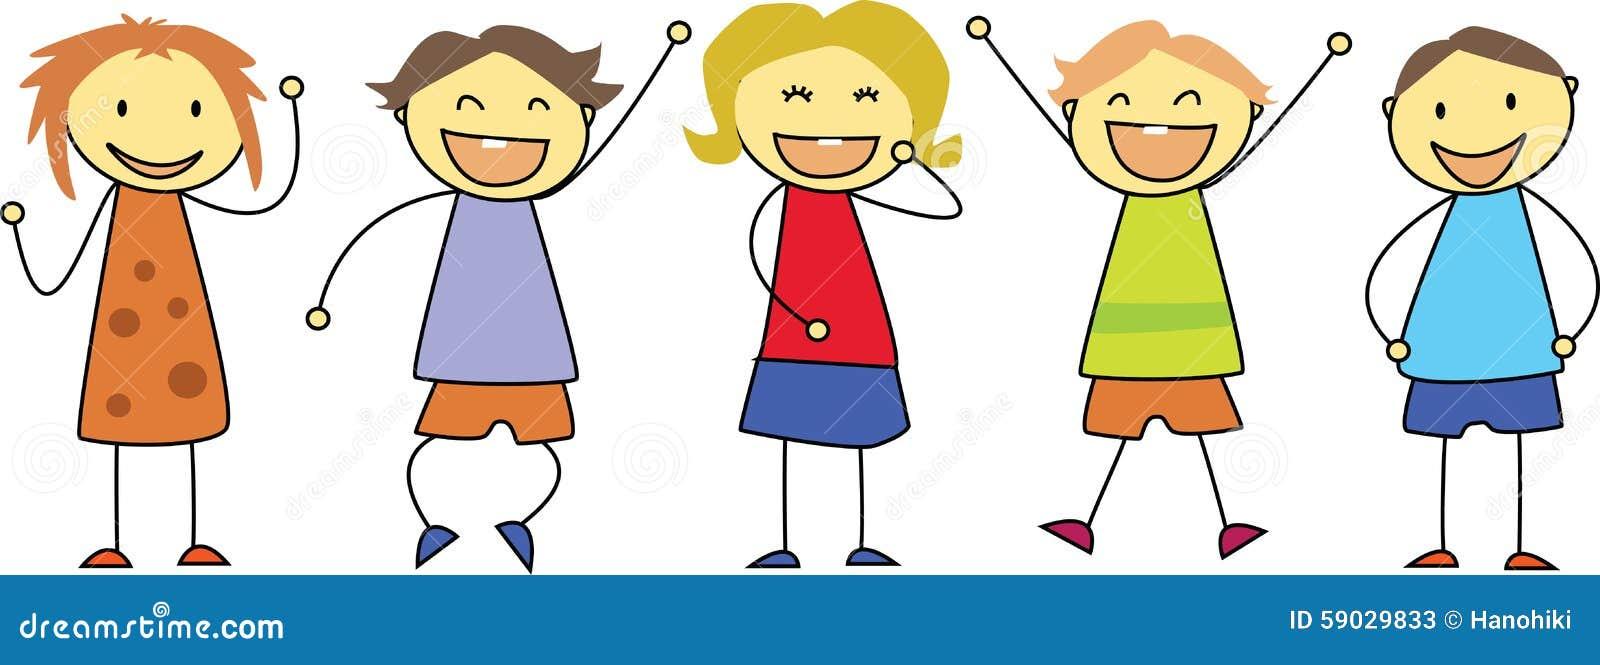 Kids Drawing - Happy Children Smiling Stock Vector - Image ...